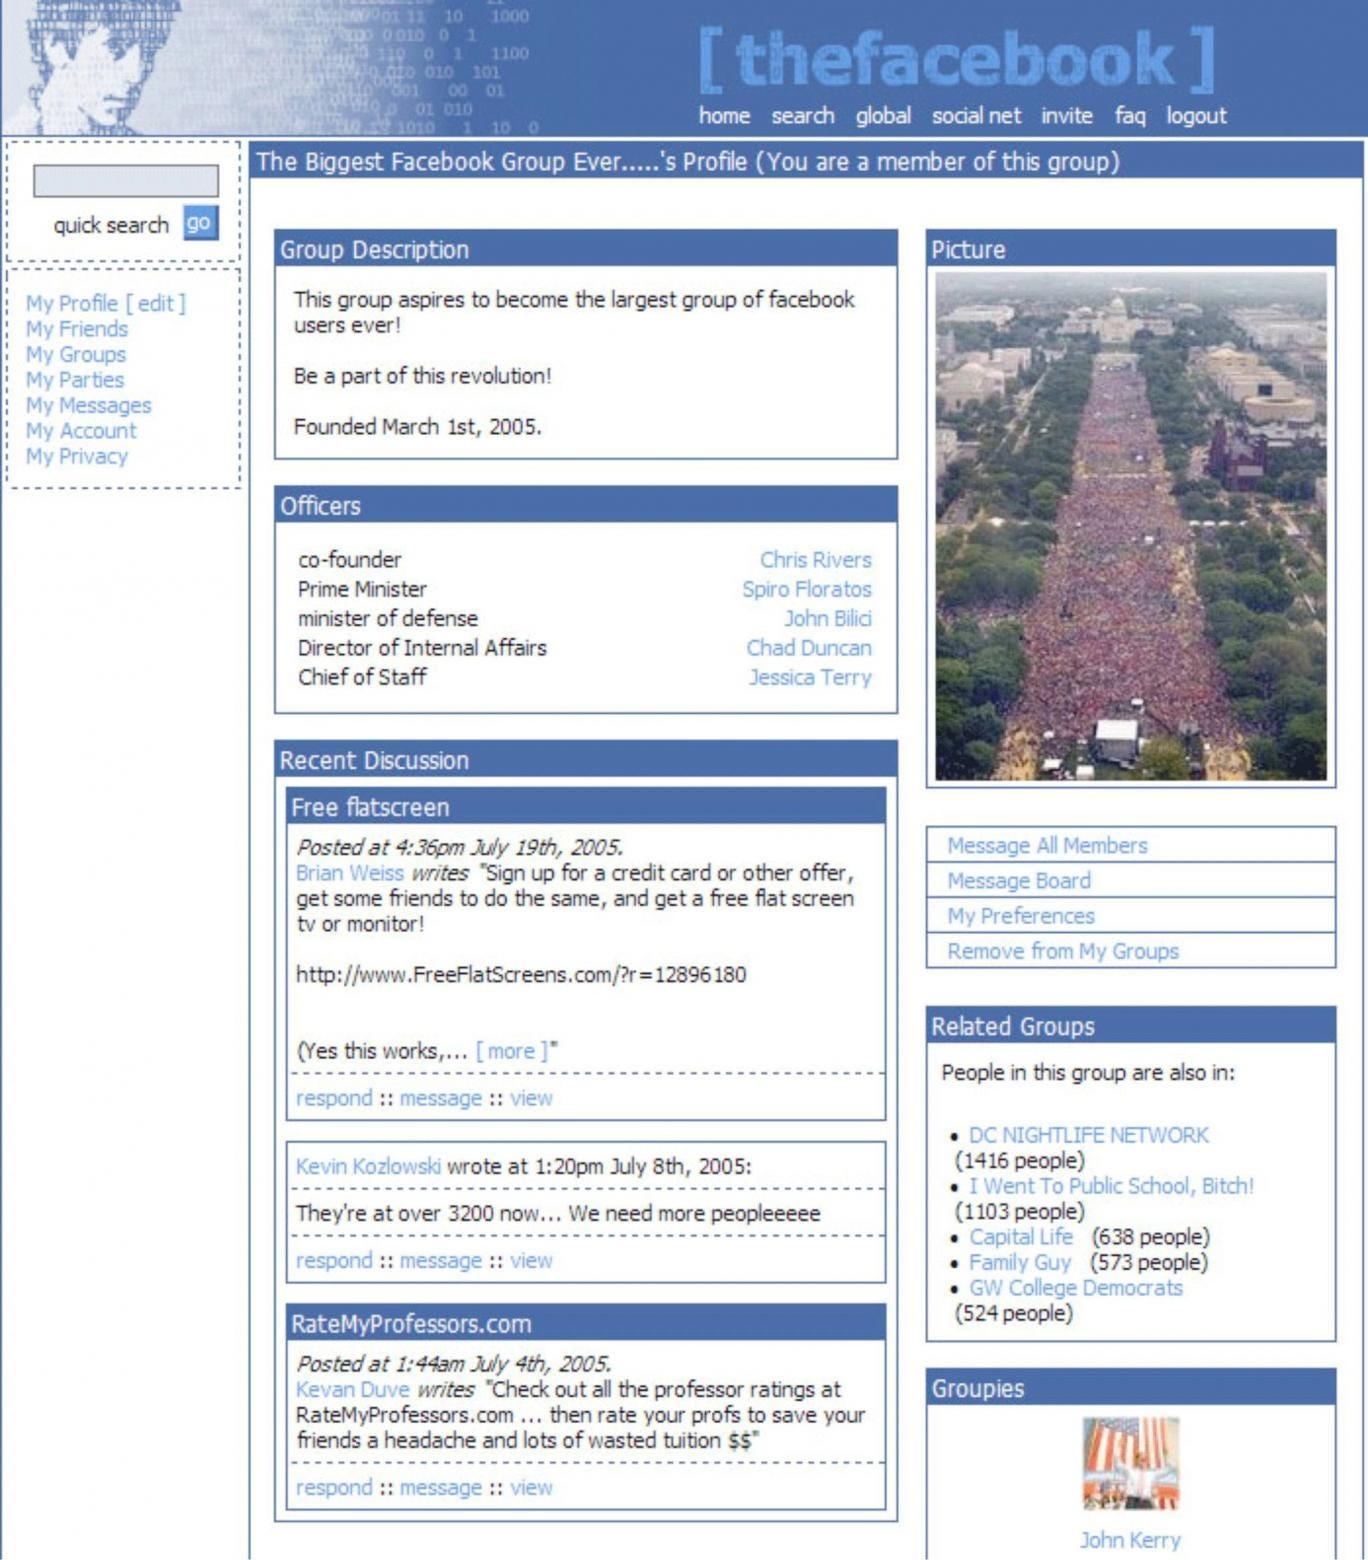 http://static.independent.co.uk/s3fs-public/styles/story_large/public/thumbnails/image/2014/02/04/11/2004v2.jpg